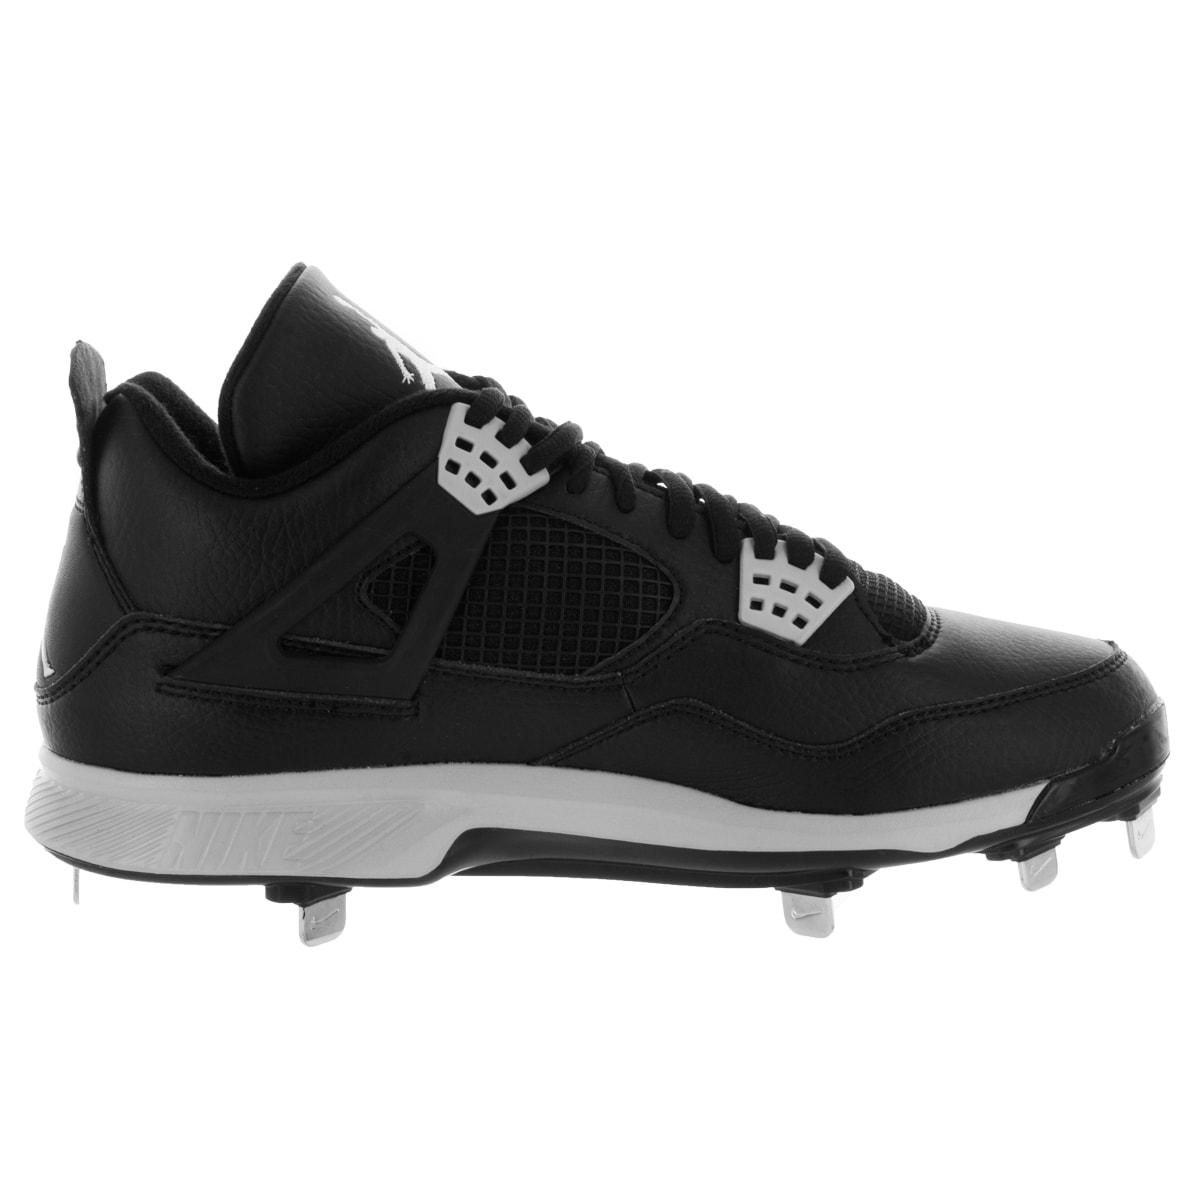 087f2a80dfbd Shop Nike Jordan Men s Jordan Iv Retro Metal Black Tech Grey Baseball Cleat  - Free Shipping Today - Overstock - 12329231